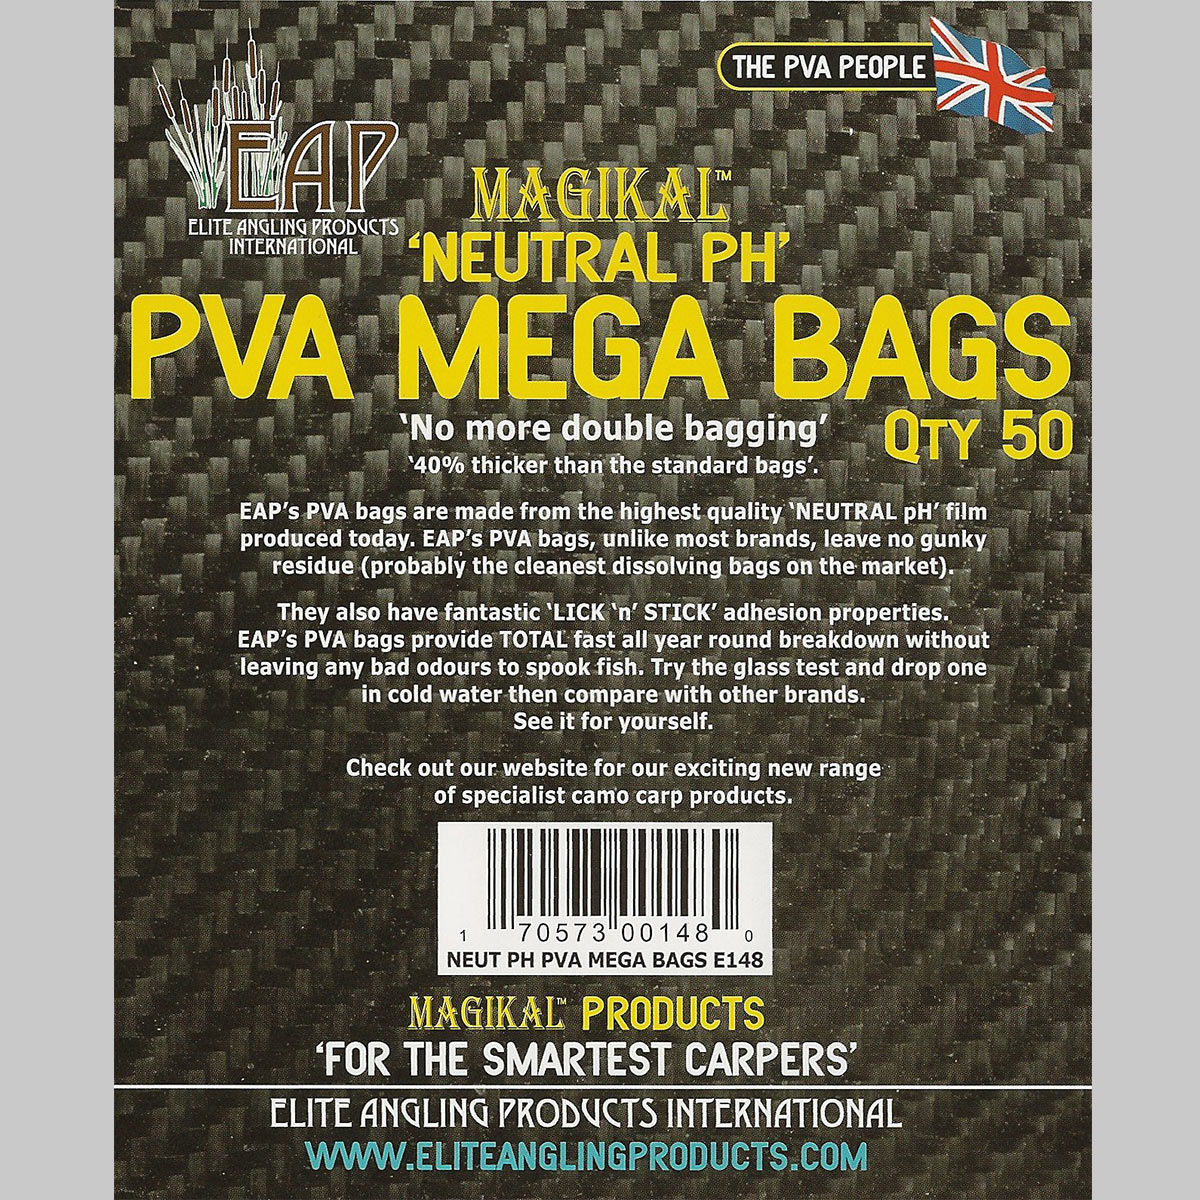 7c359479ac72 Mega Bags (Thick - 100x125mm) - 50 pack - EAP PVA Direct -